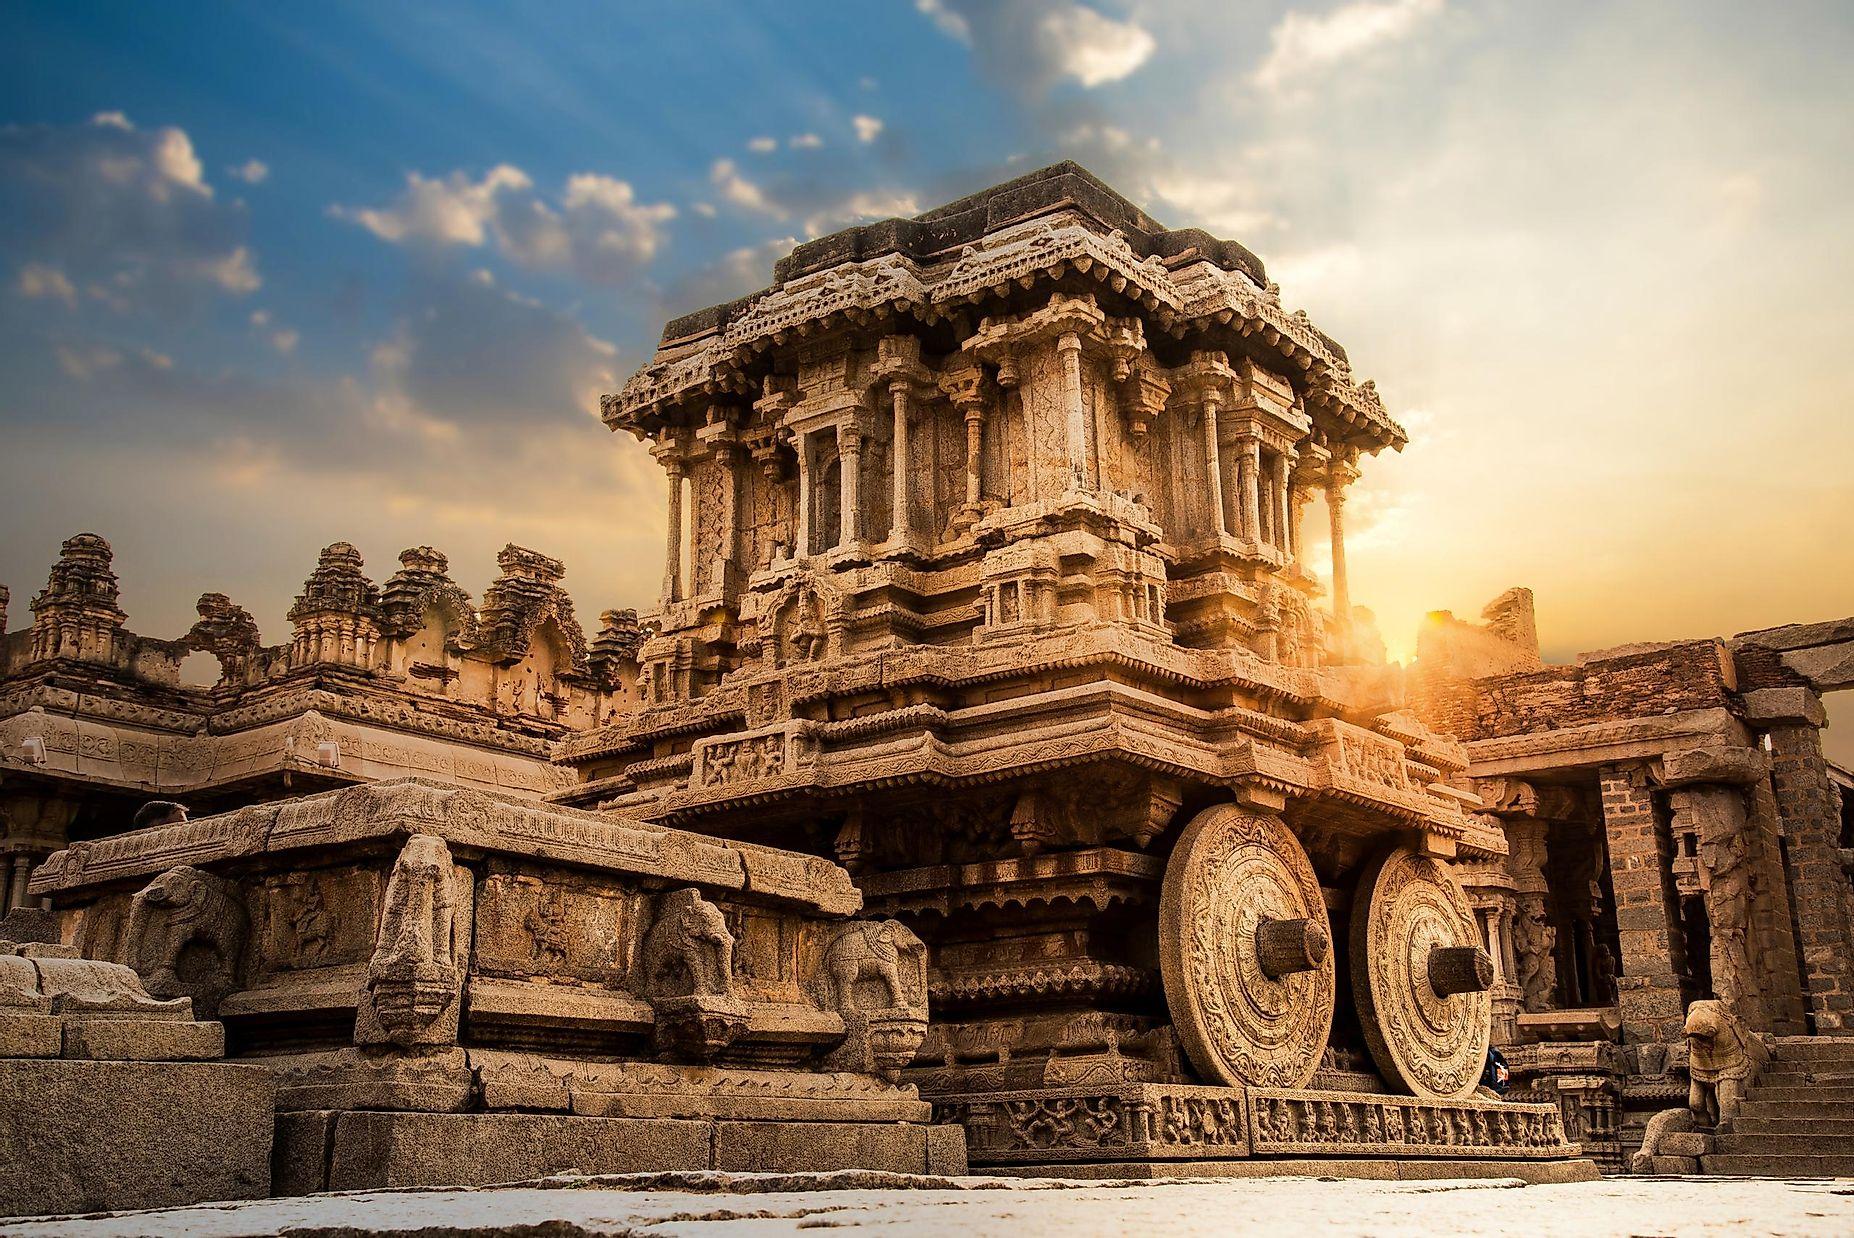 Hampi - Unique Ruins Of The Vijayanagara Empire